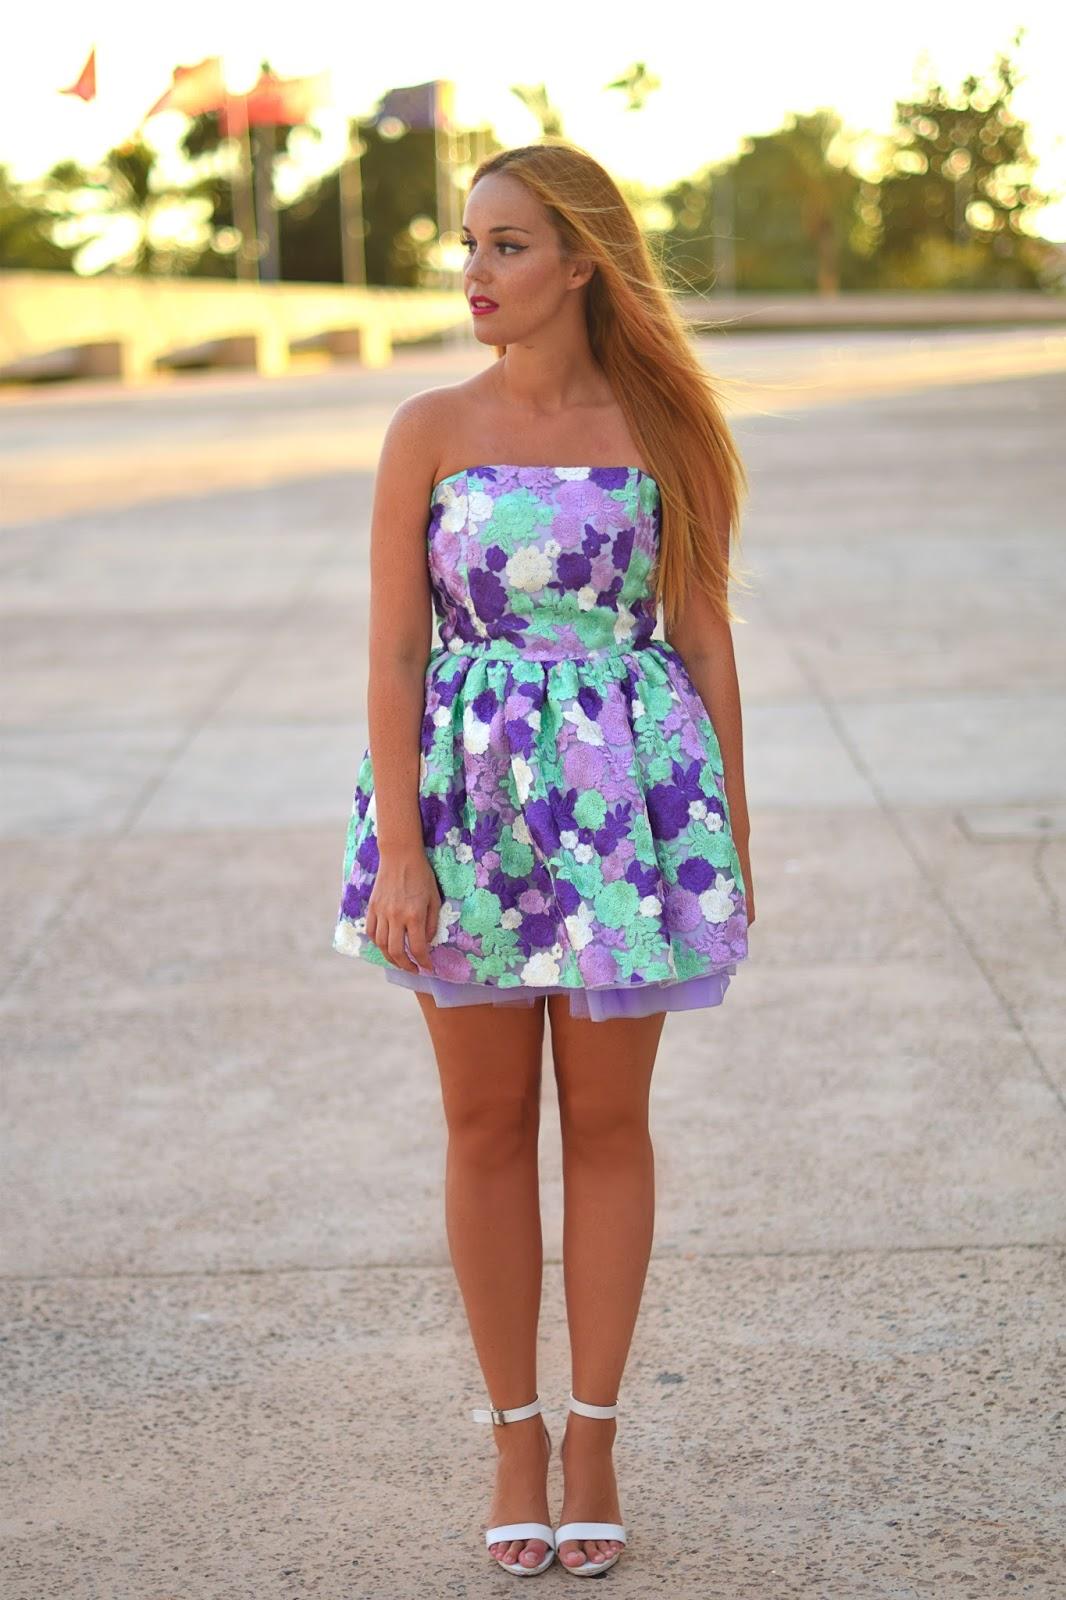 nery hdez, jones and jones, party dress, floral print